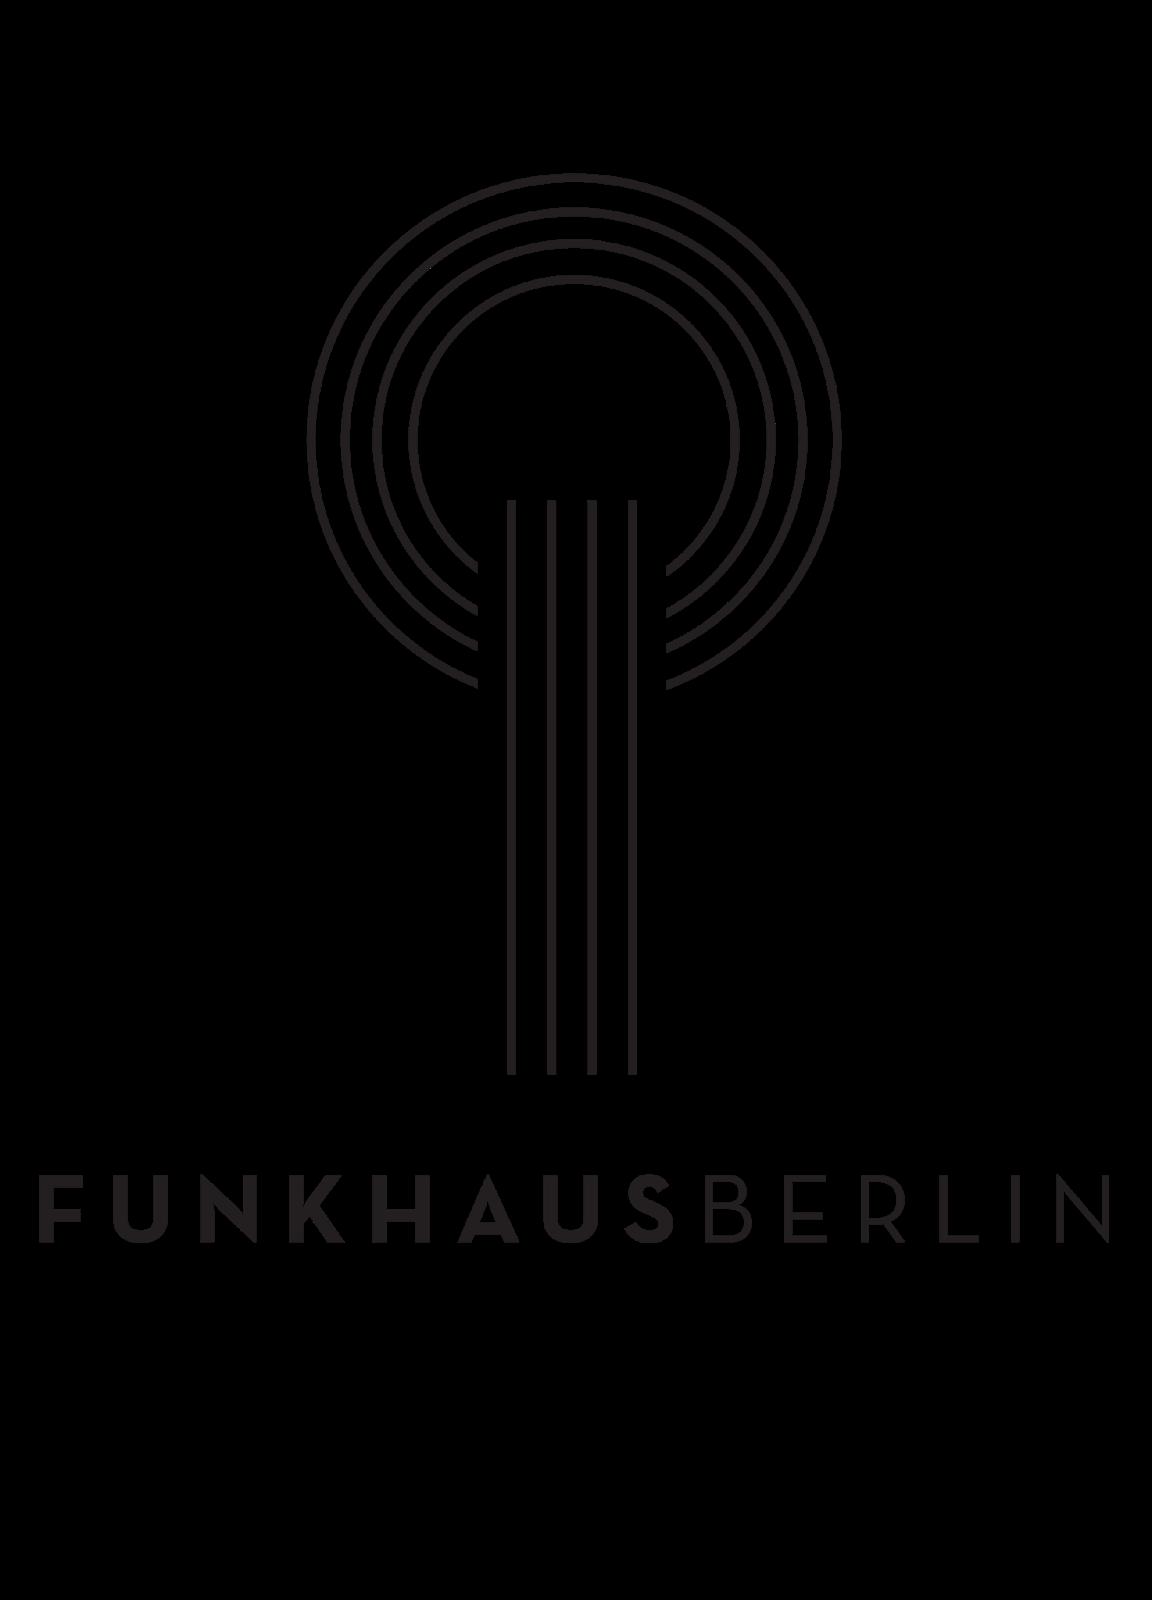 funkhaus_logo_standard3.png